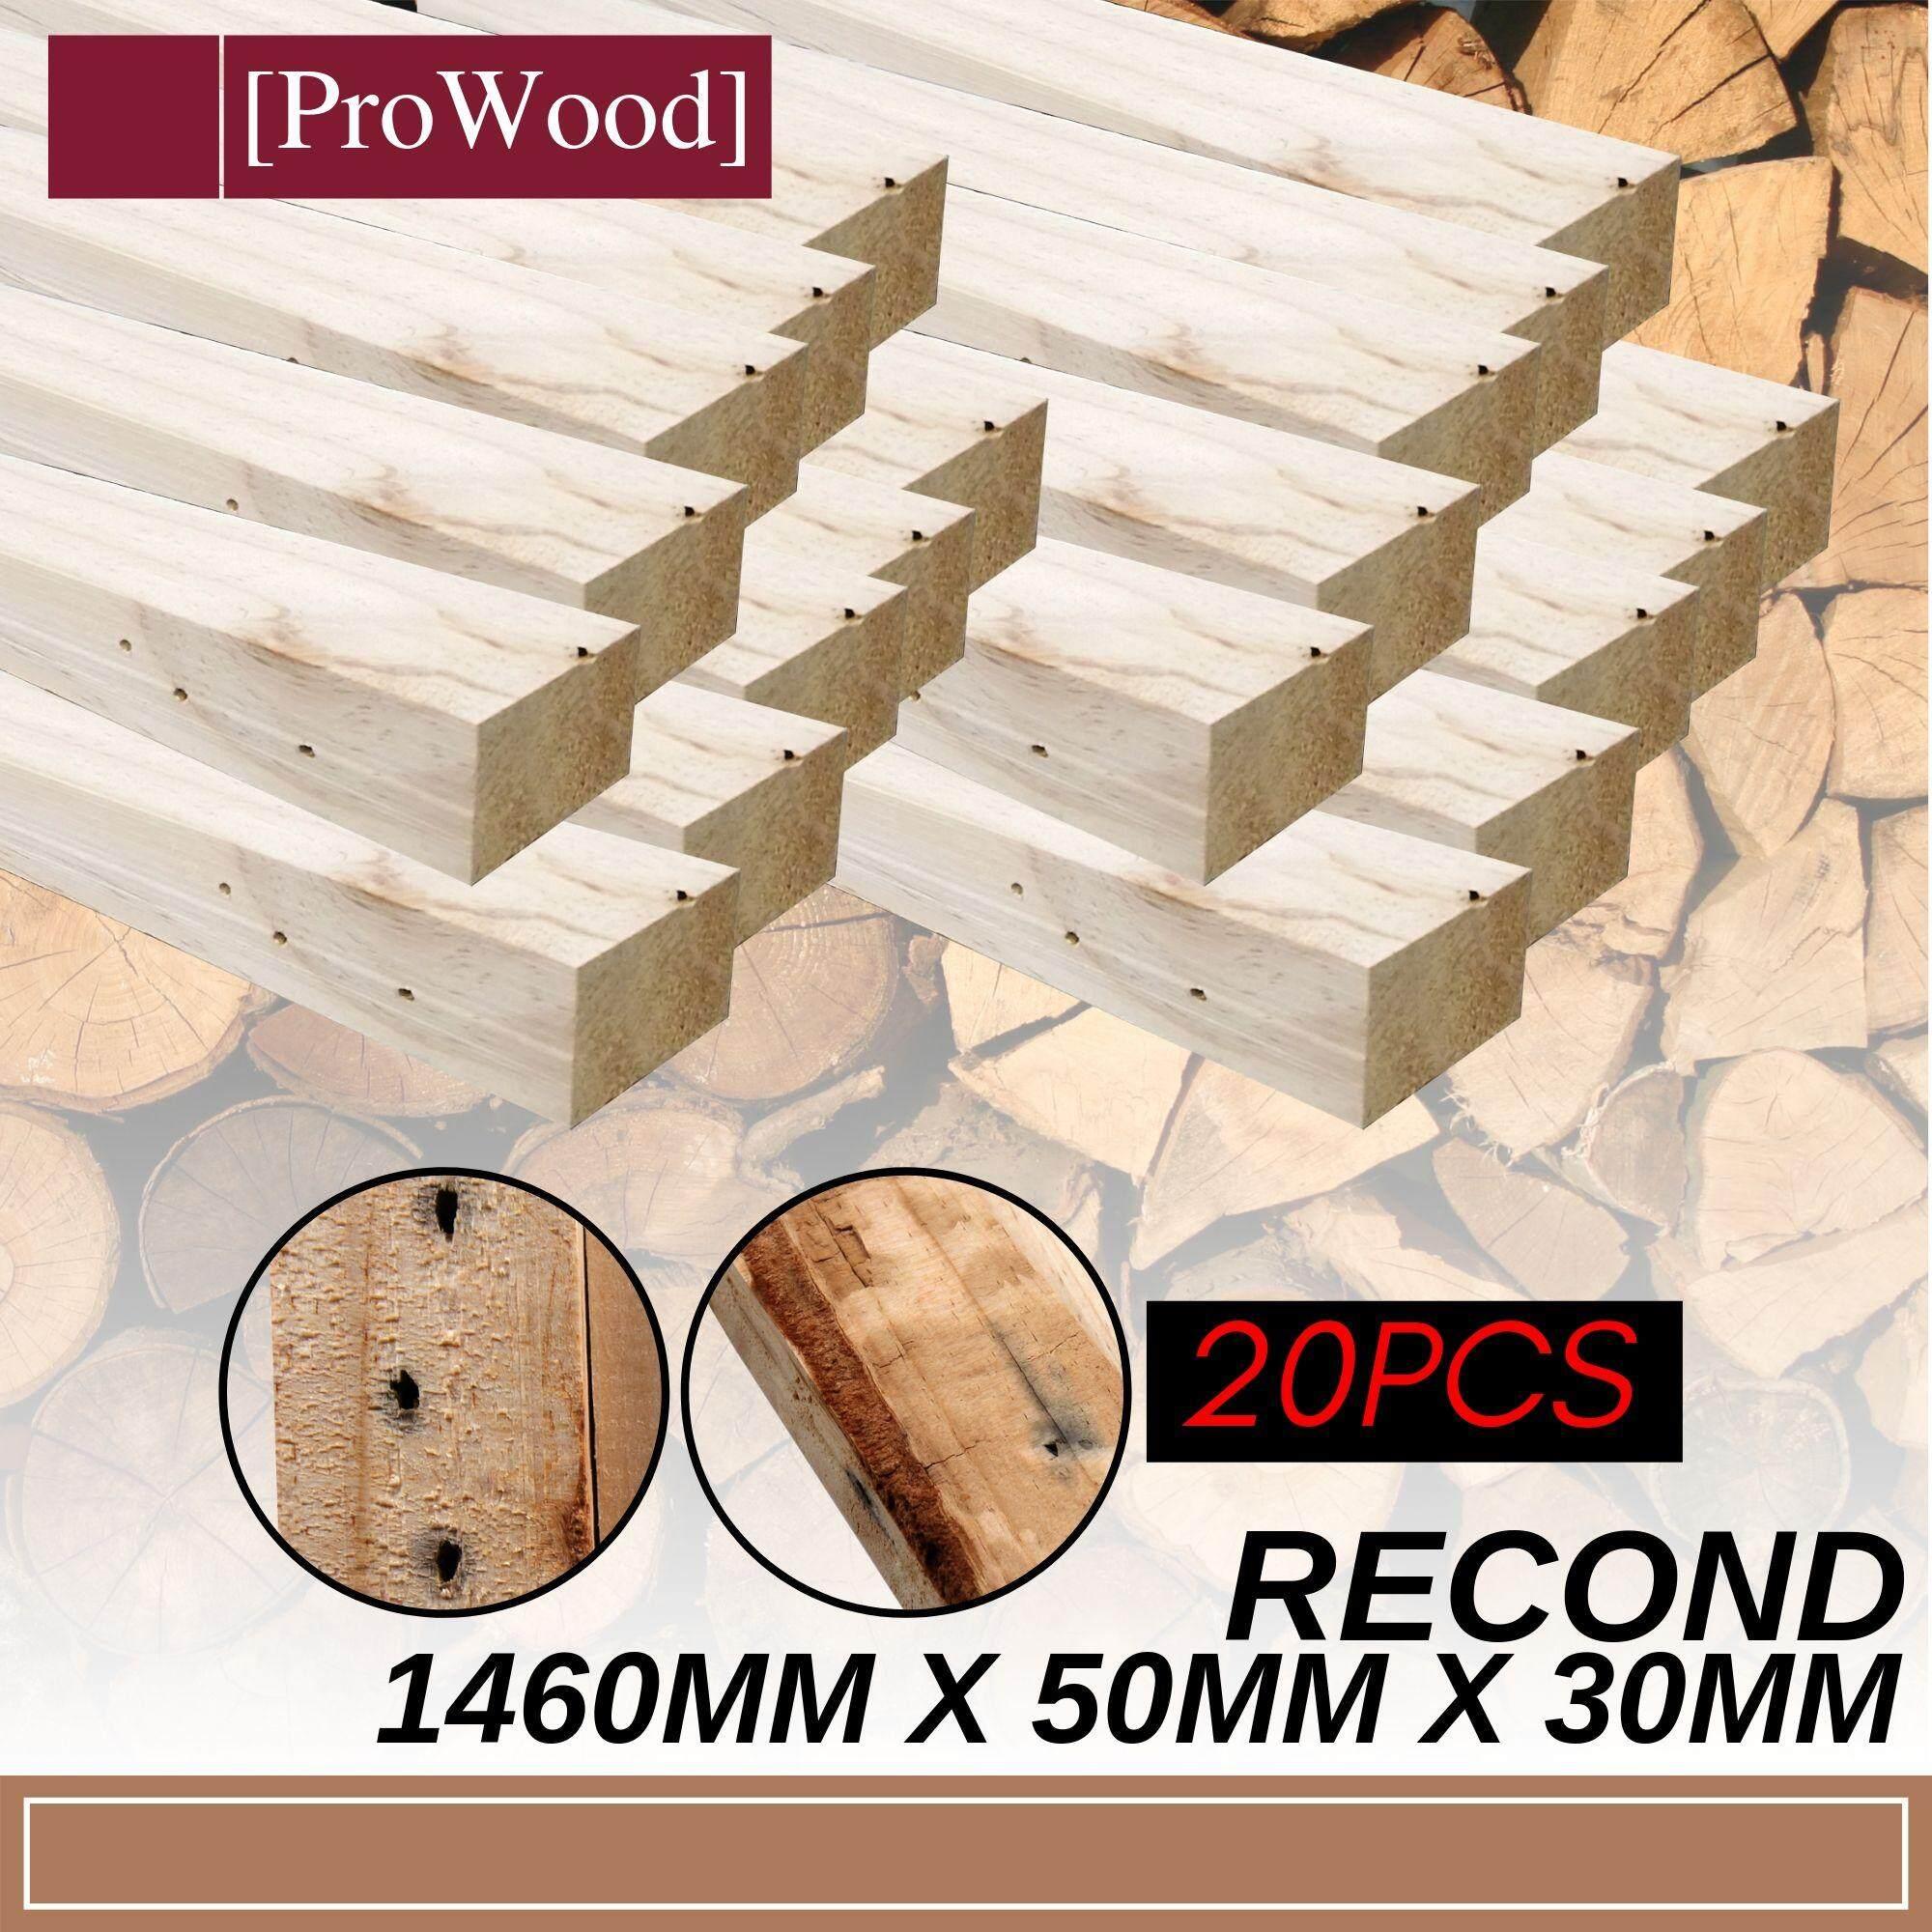 20Pcs 1460mm x 50mm x 30mm Rectangular DIY Deco Craft Pine Wood Plank ( Recond )